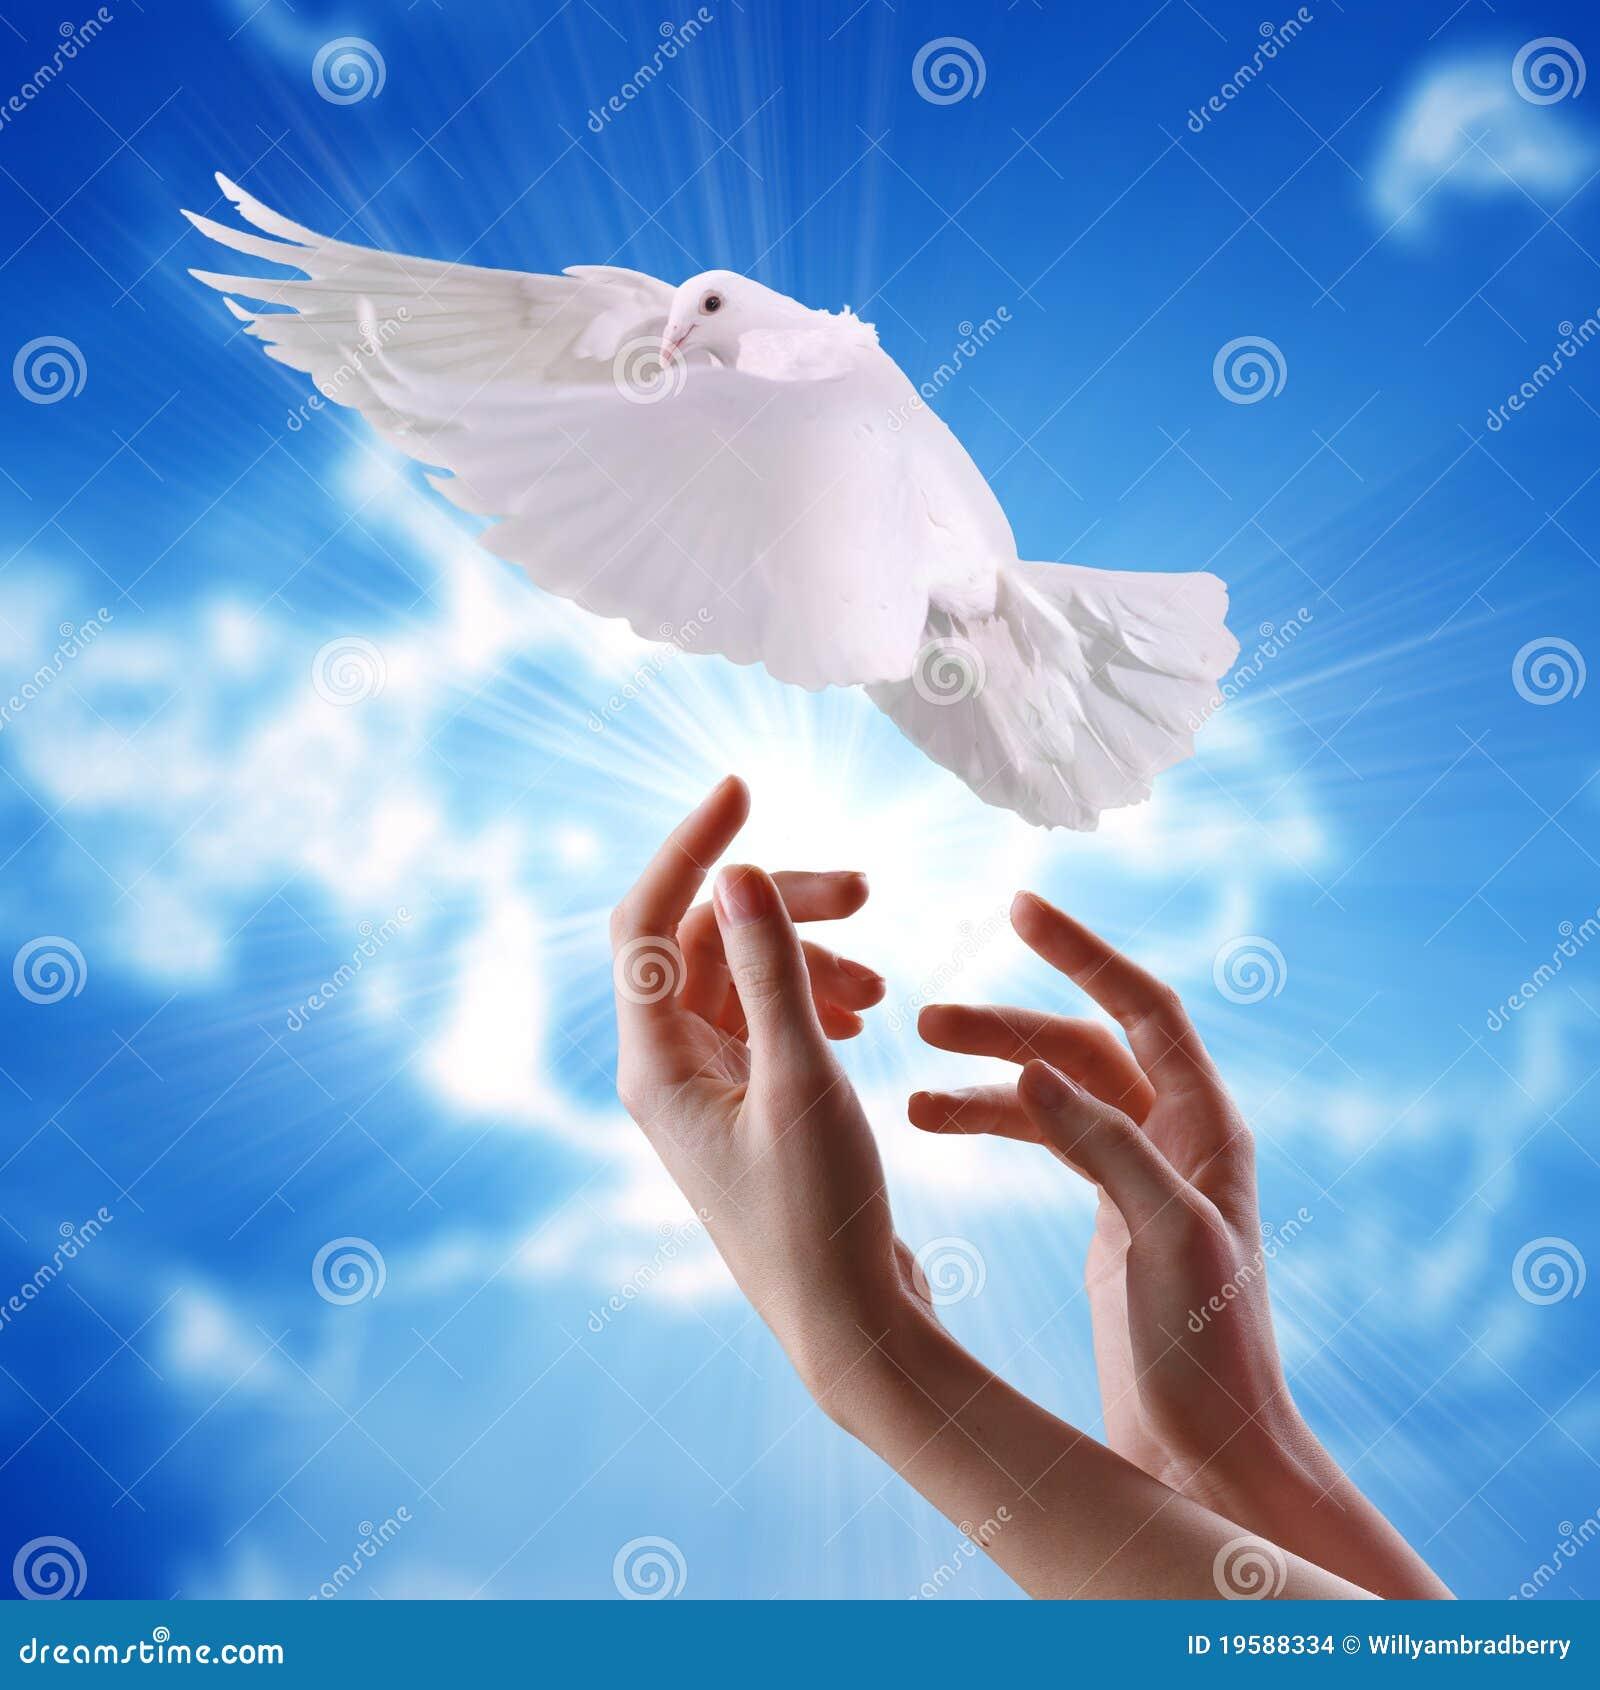 beautiful pigeon hd wallpaper